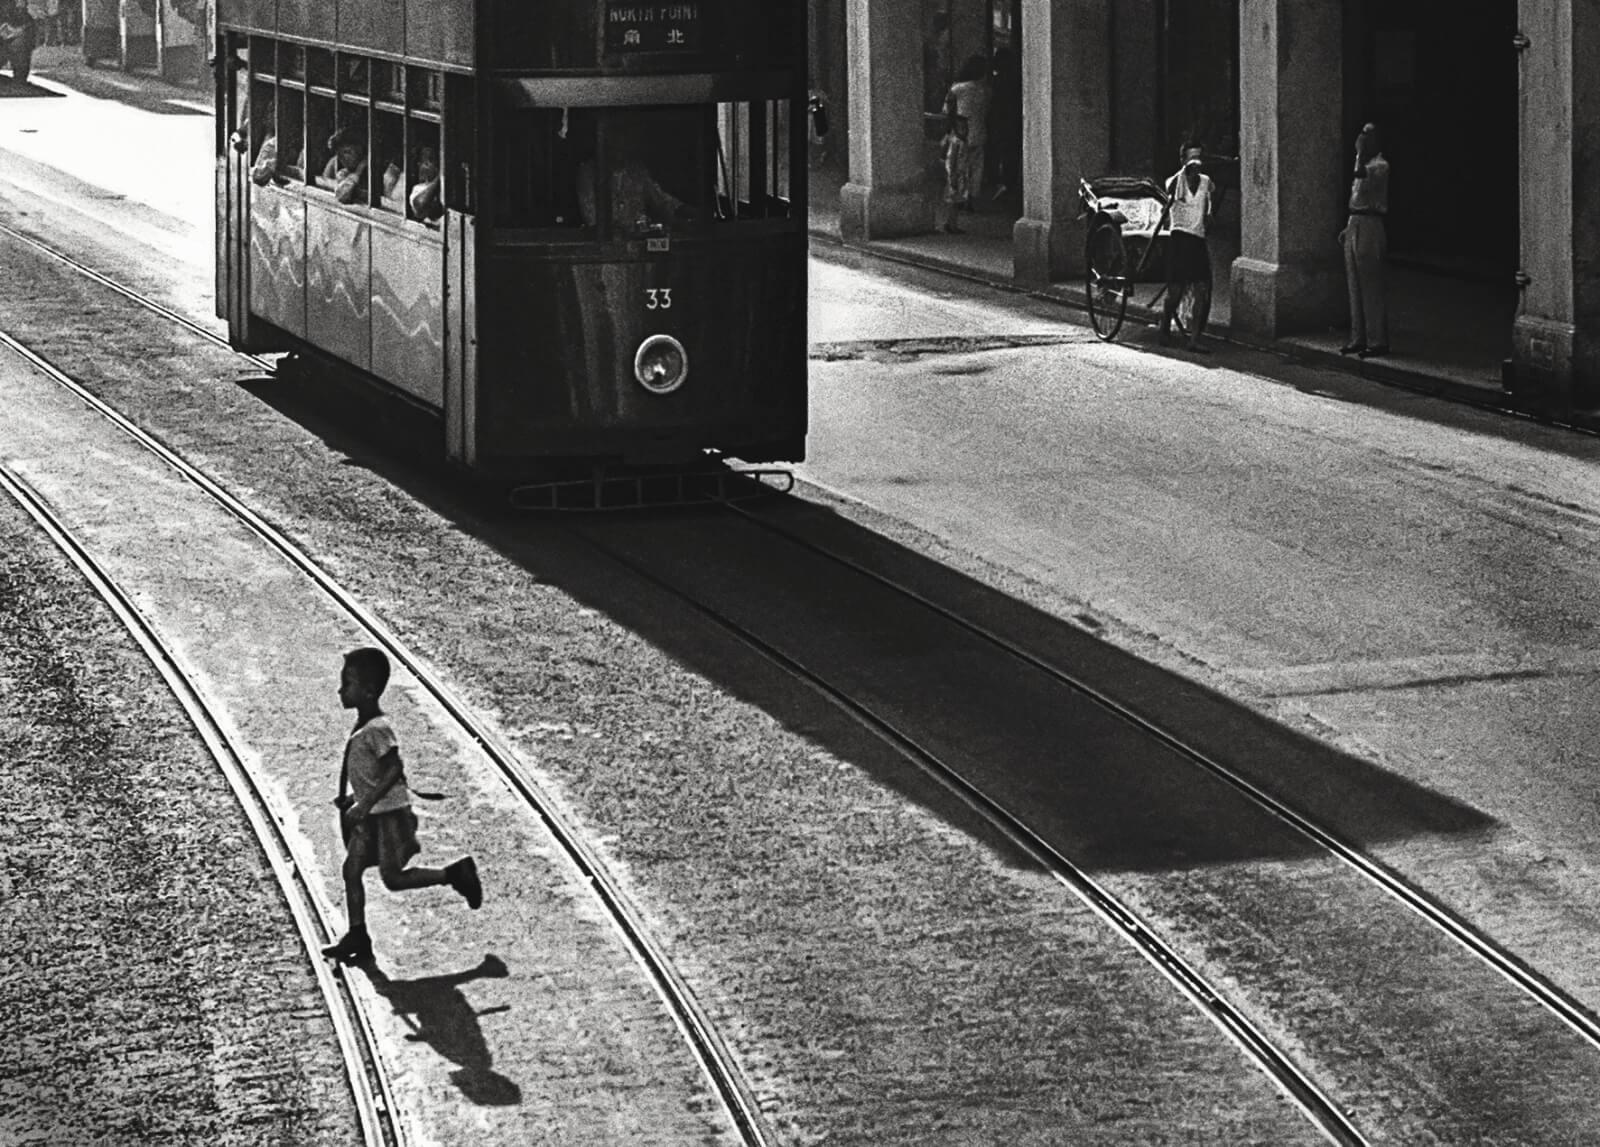 Fan Ho 何藩, Don't Look Back(向前看) Hong Kong 50-60's, Courtesy of Blue Lotus Gallery